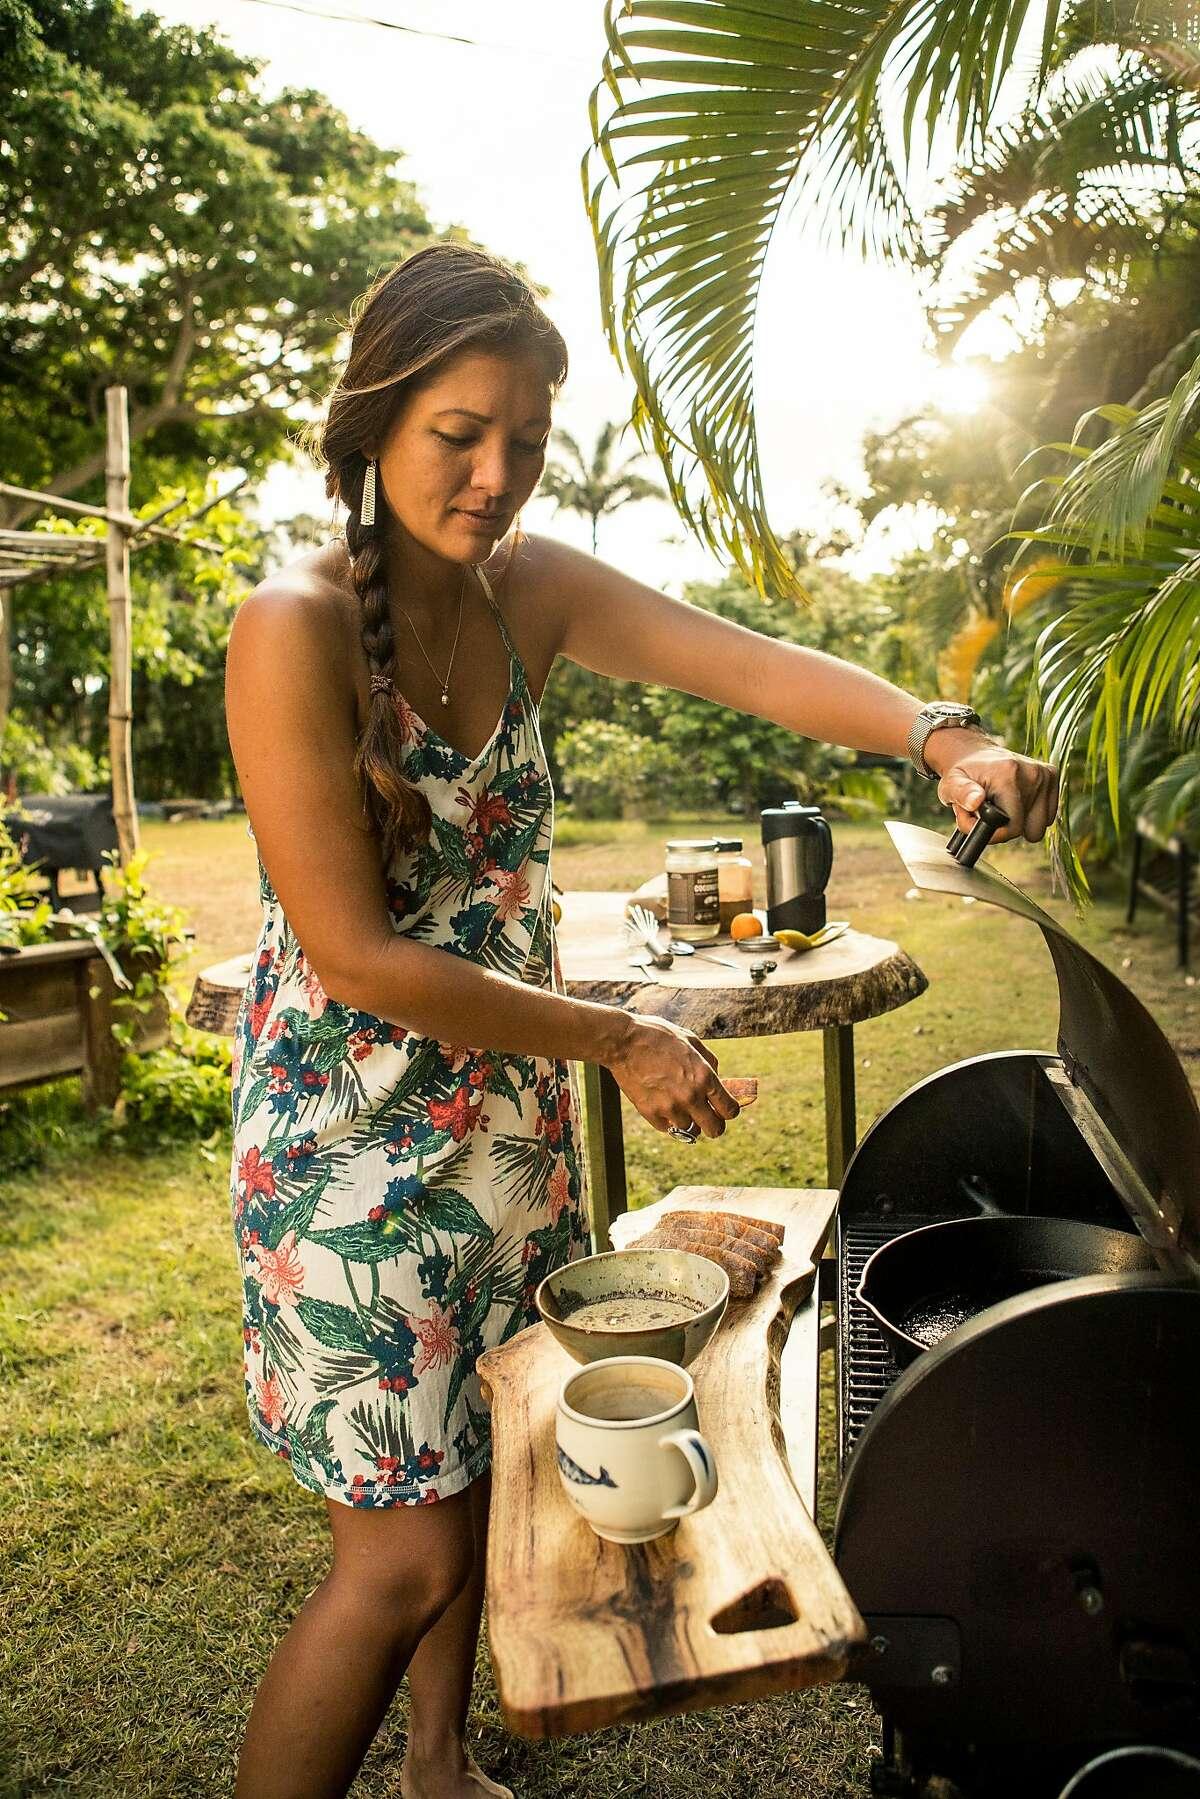 Kimi Werner prepares a meal on Friday, July 6, 2018 in Oahu, HI